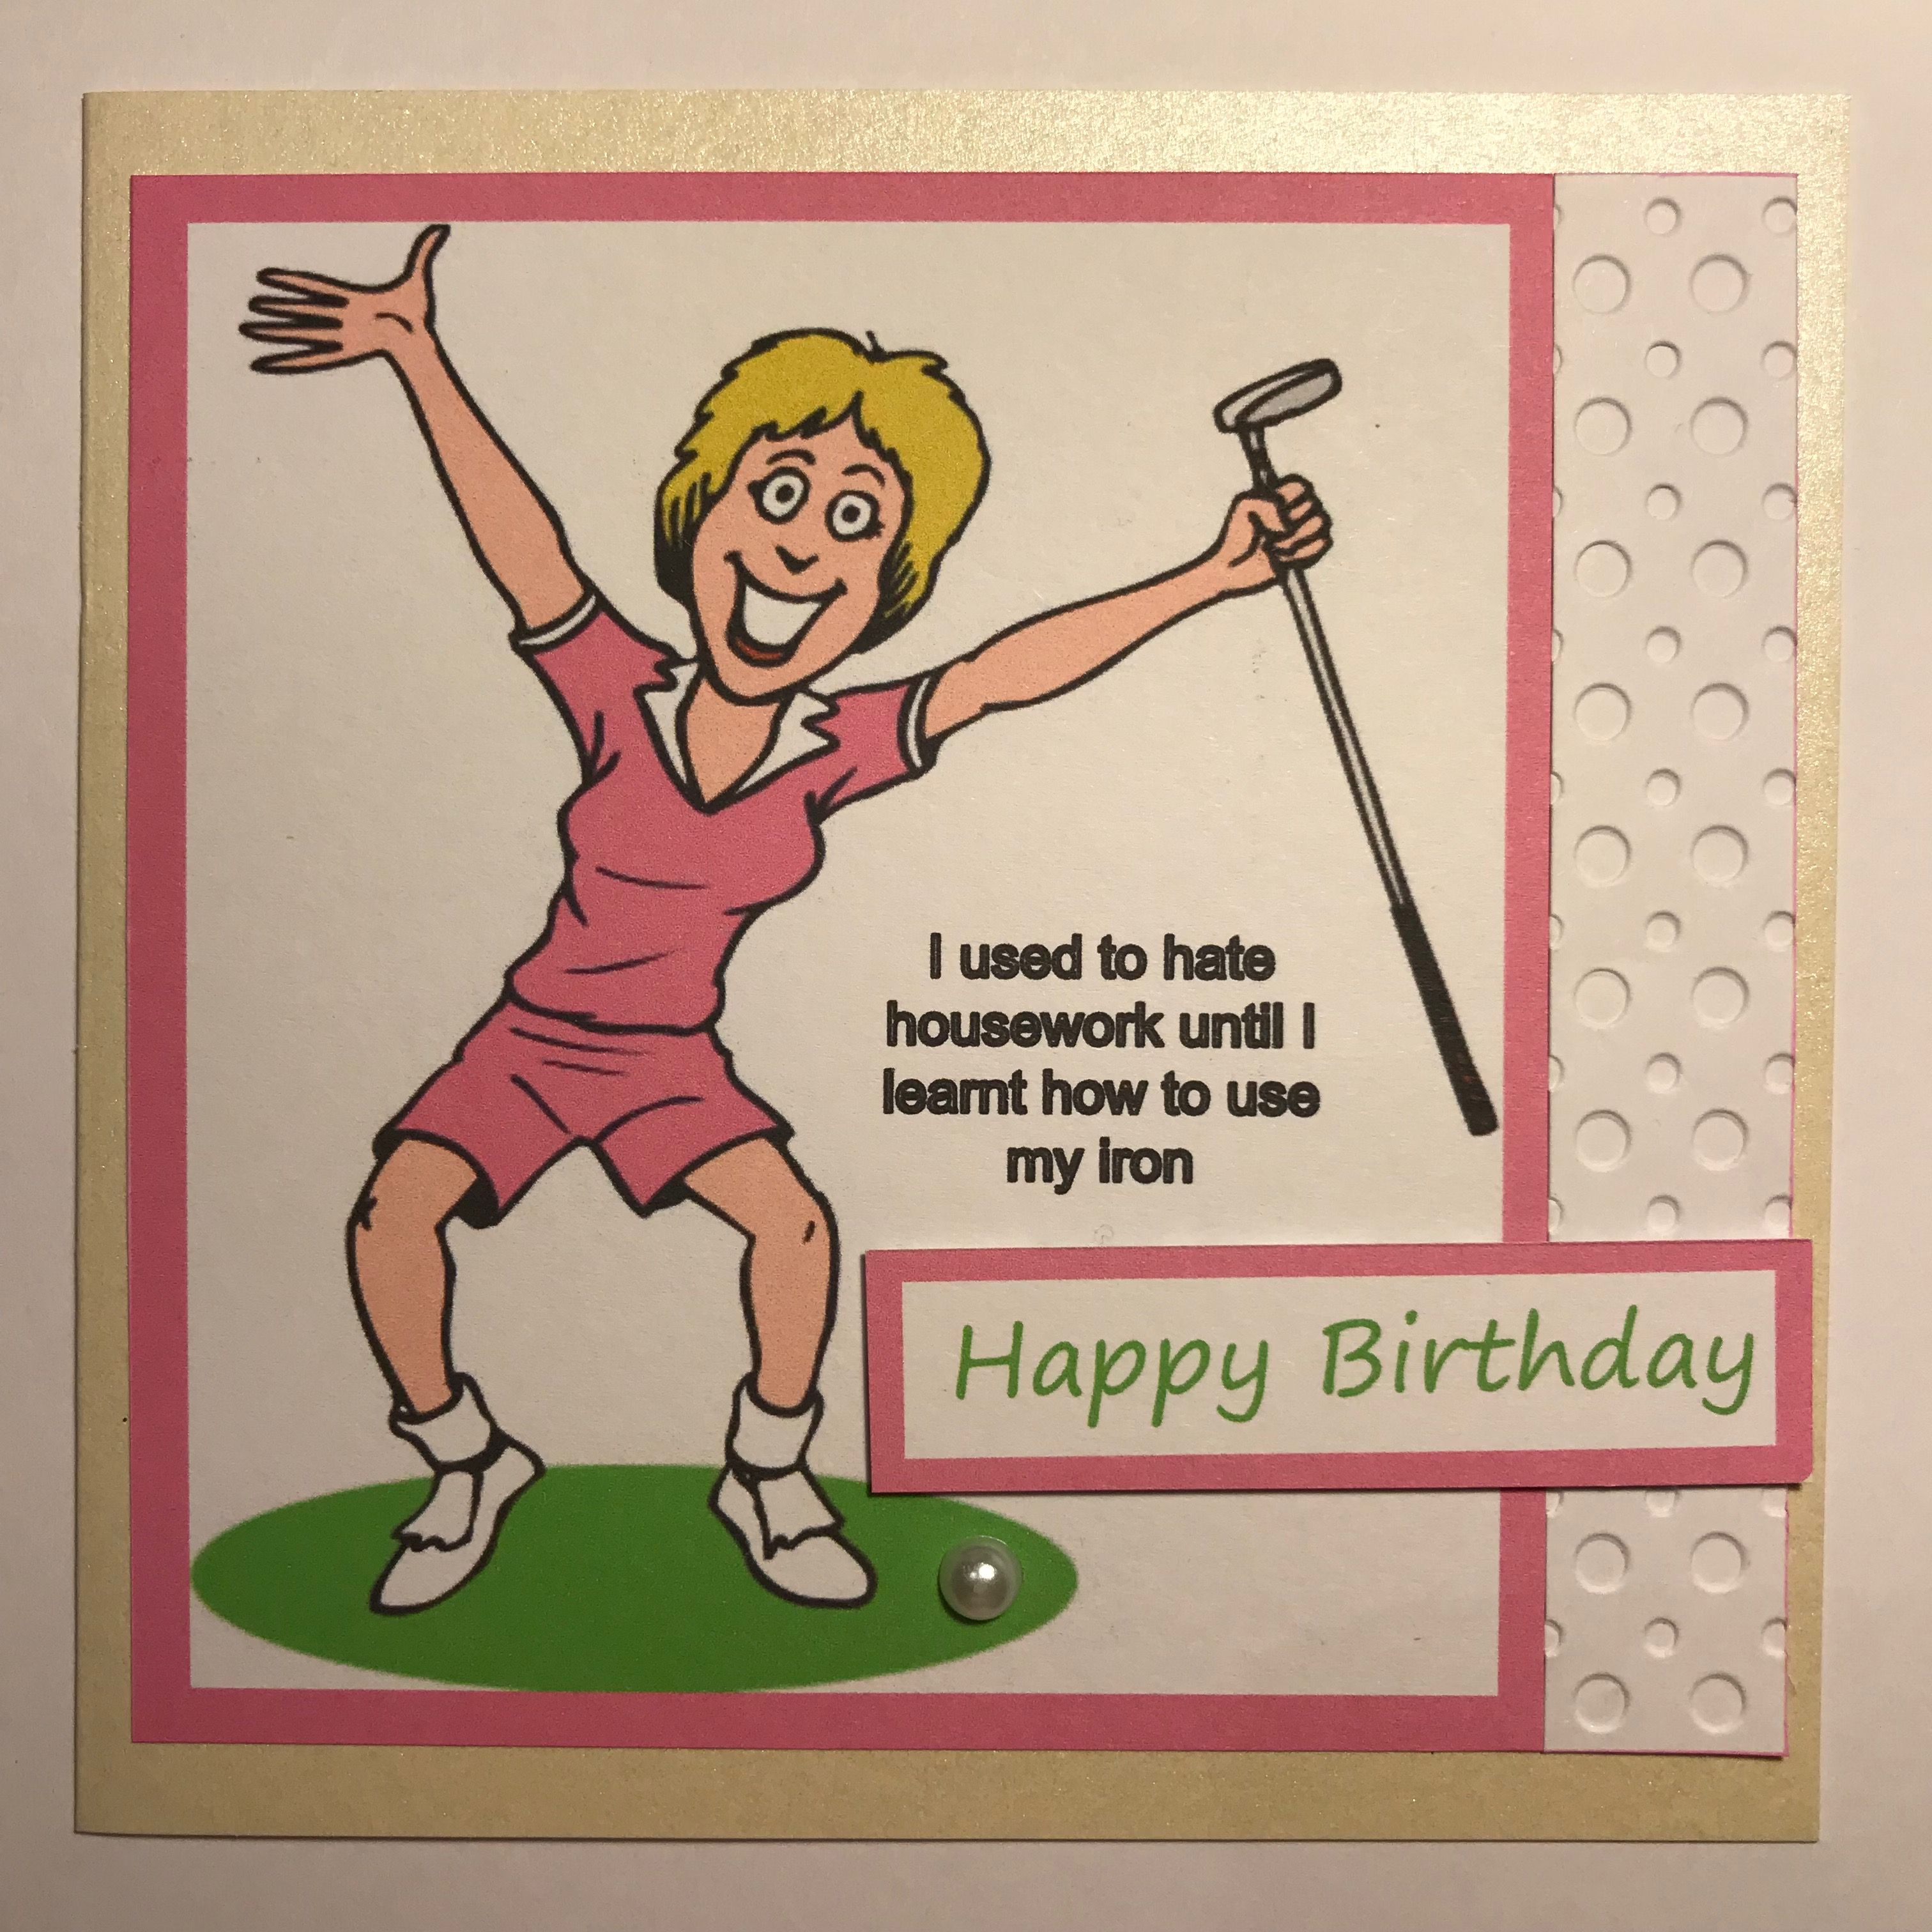 21 Amusing Happy Birthday Nephew Meme Images Happy Birthday Nephew Funny Happy Birthday Images Nephew Birthday